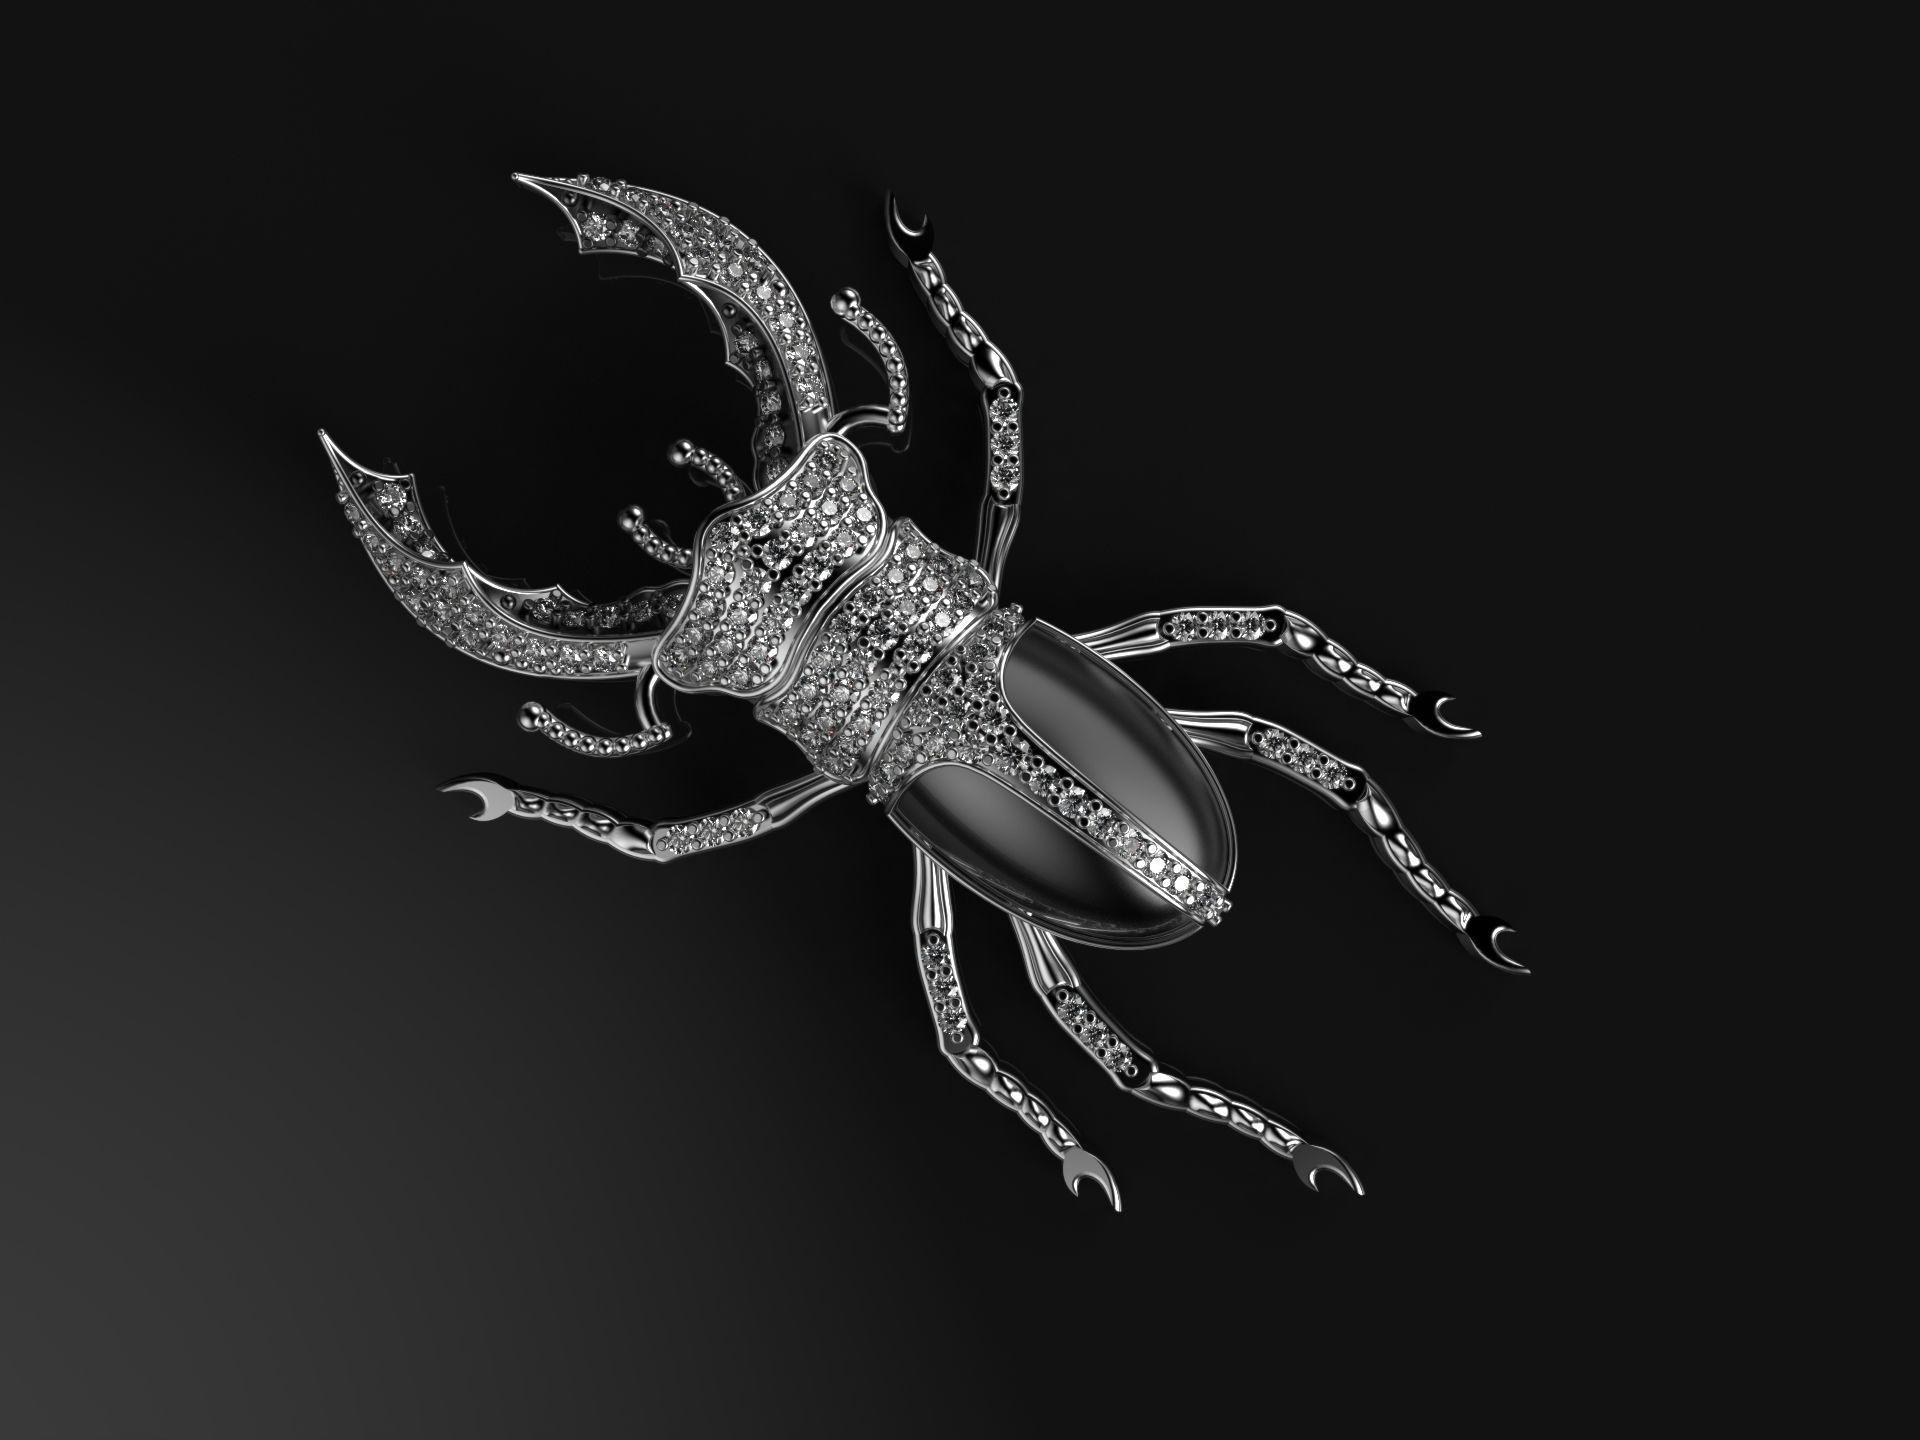 Beetle brooch with enamel